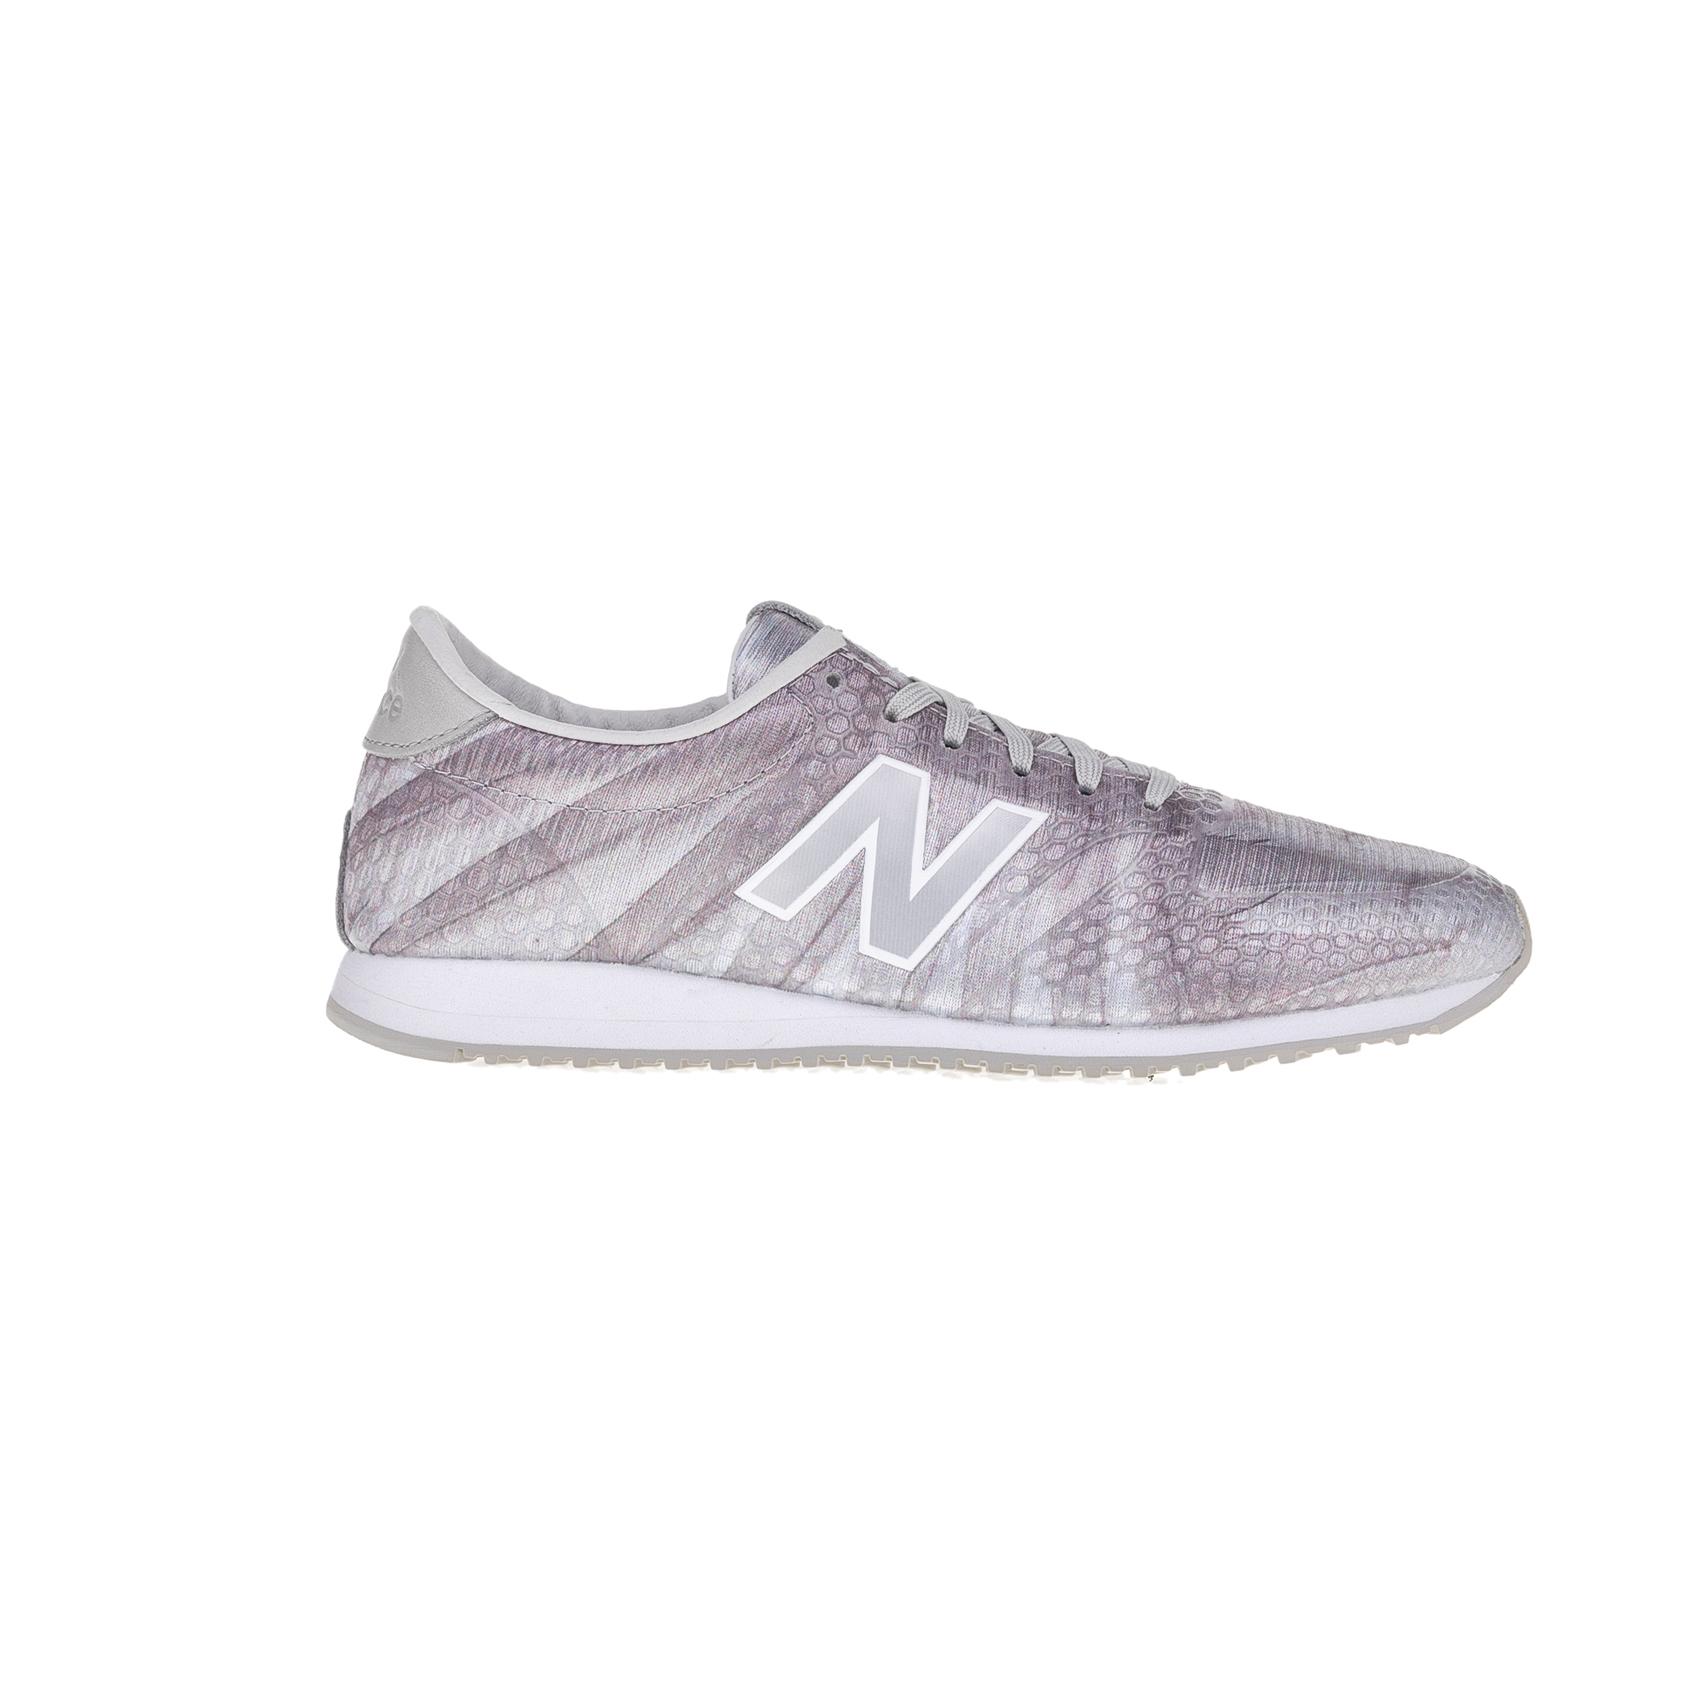 4ced2f3d78 NEW BALANCE - Γυναικεία sneakers NEW BALANCE μοβ